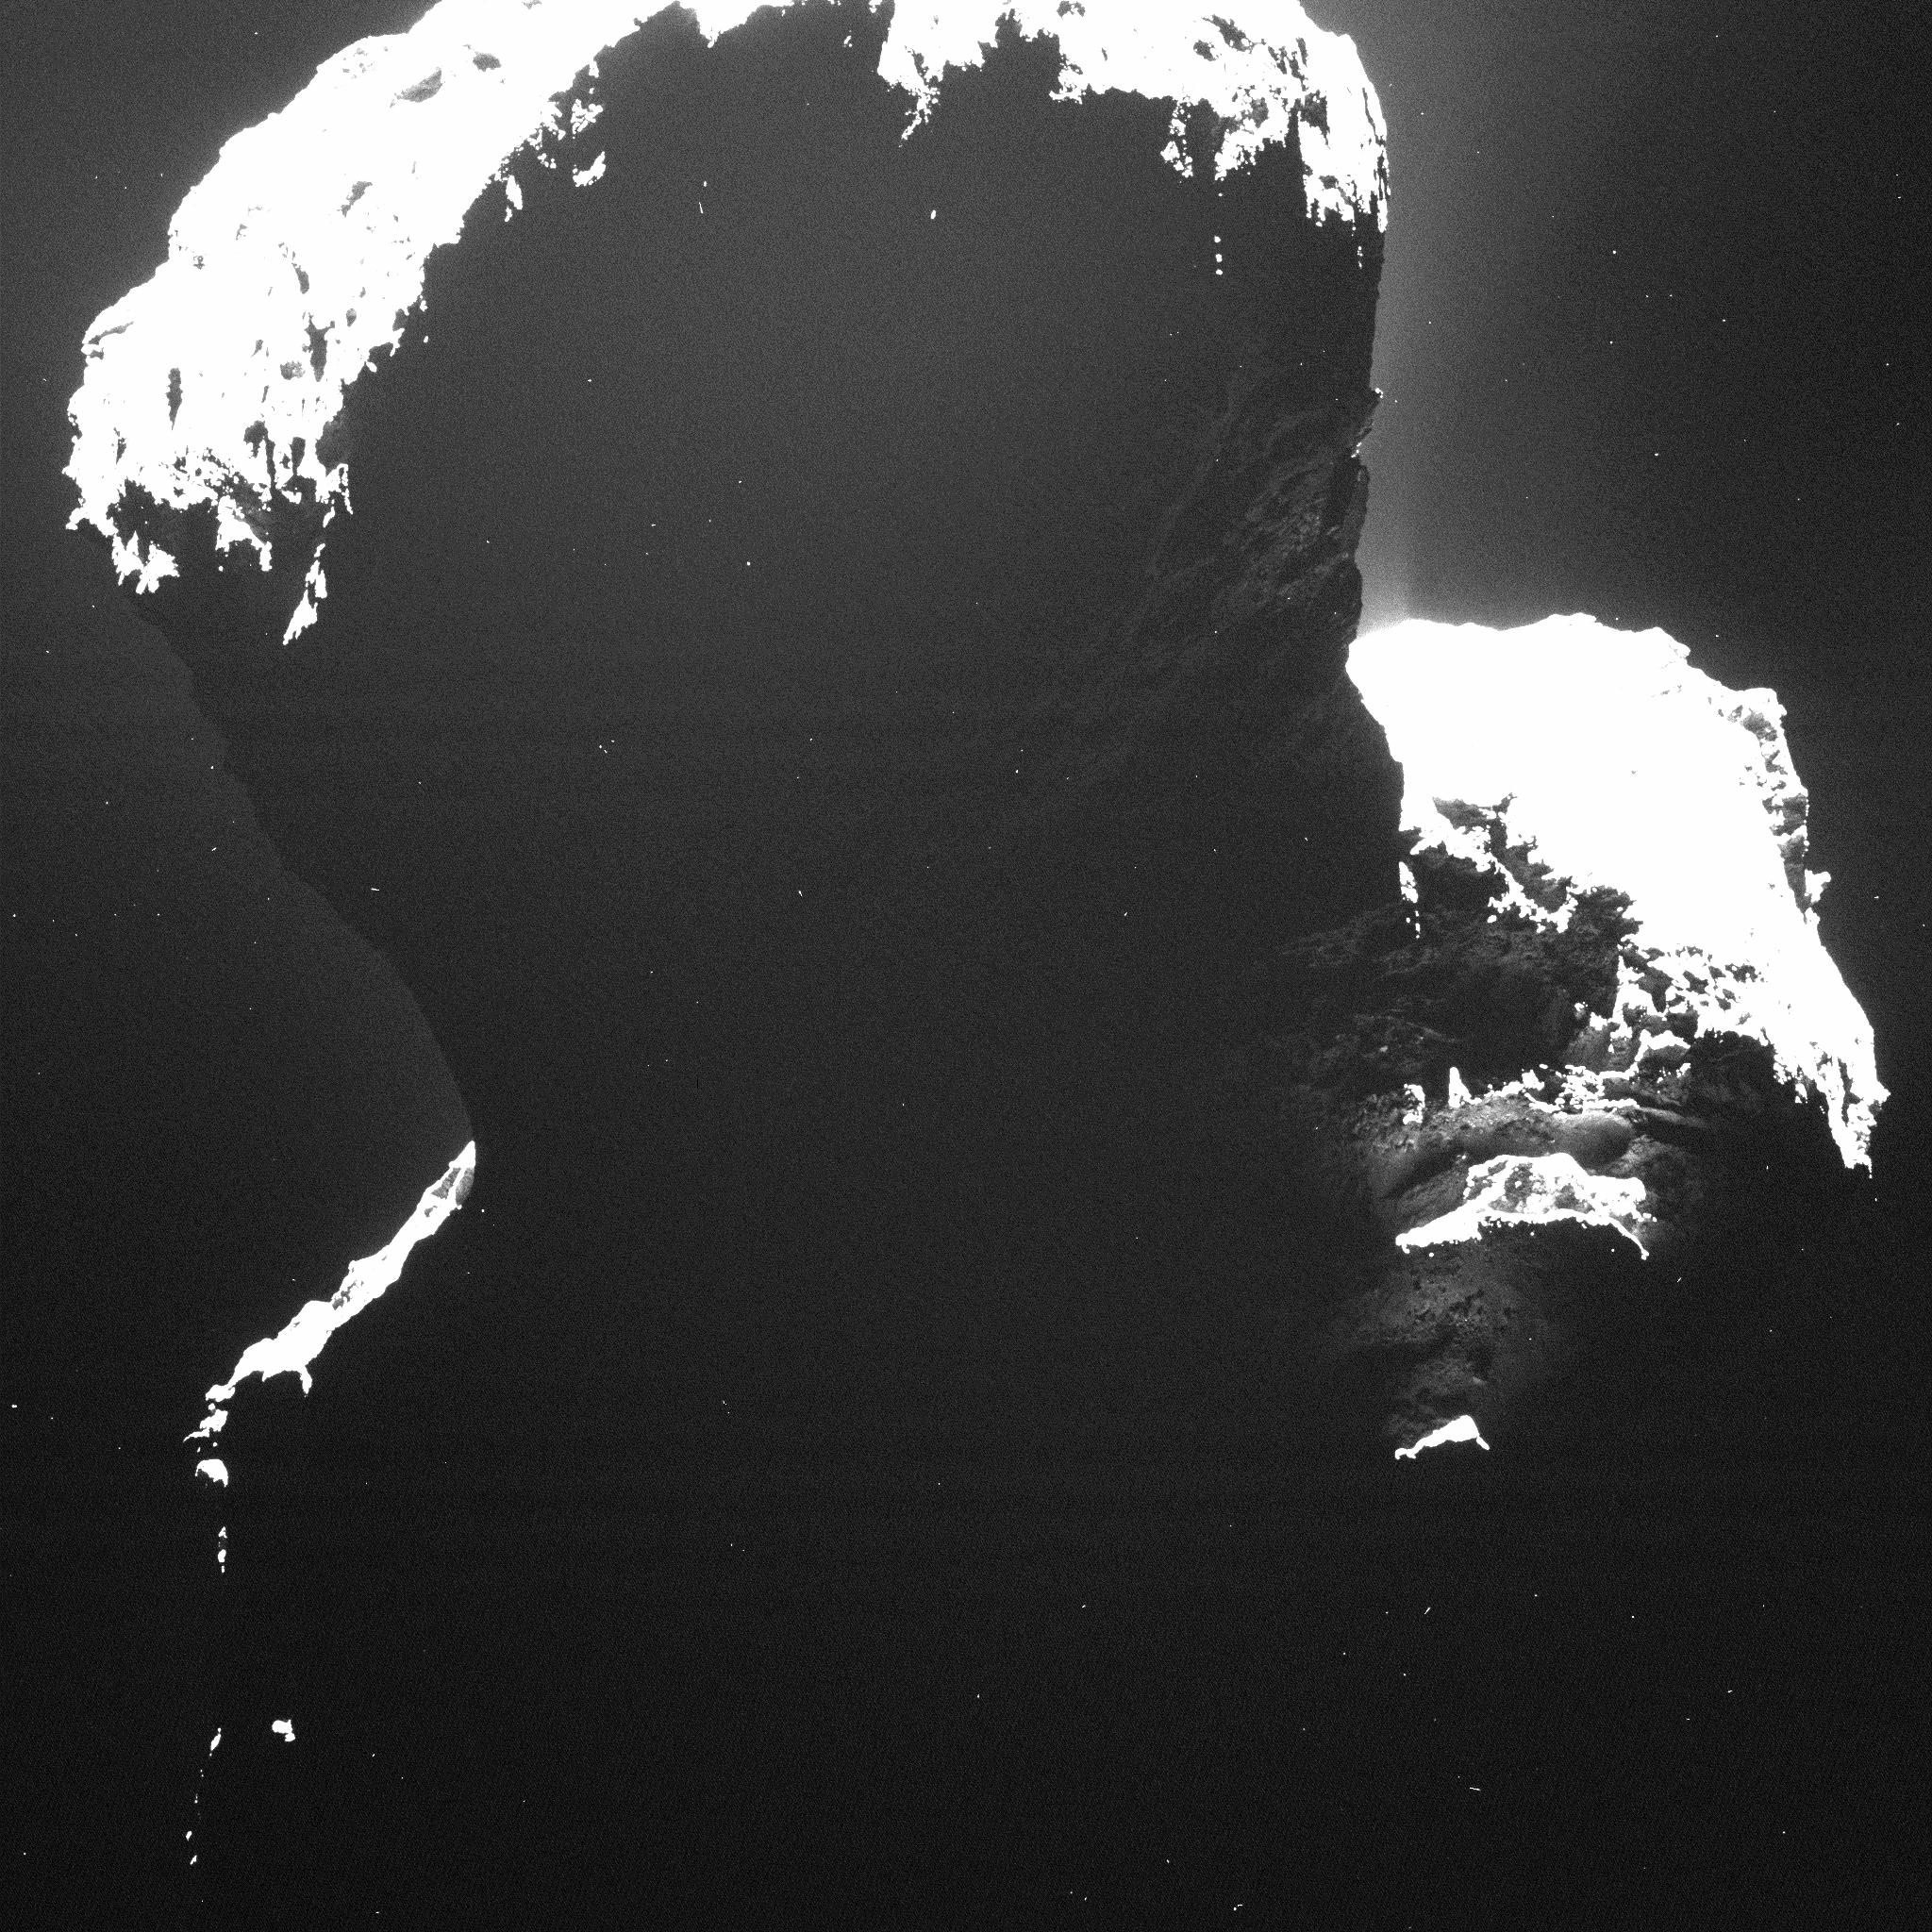 Rosetta's First Peek at the Comet's Dark Side | NASA